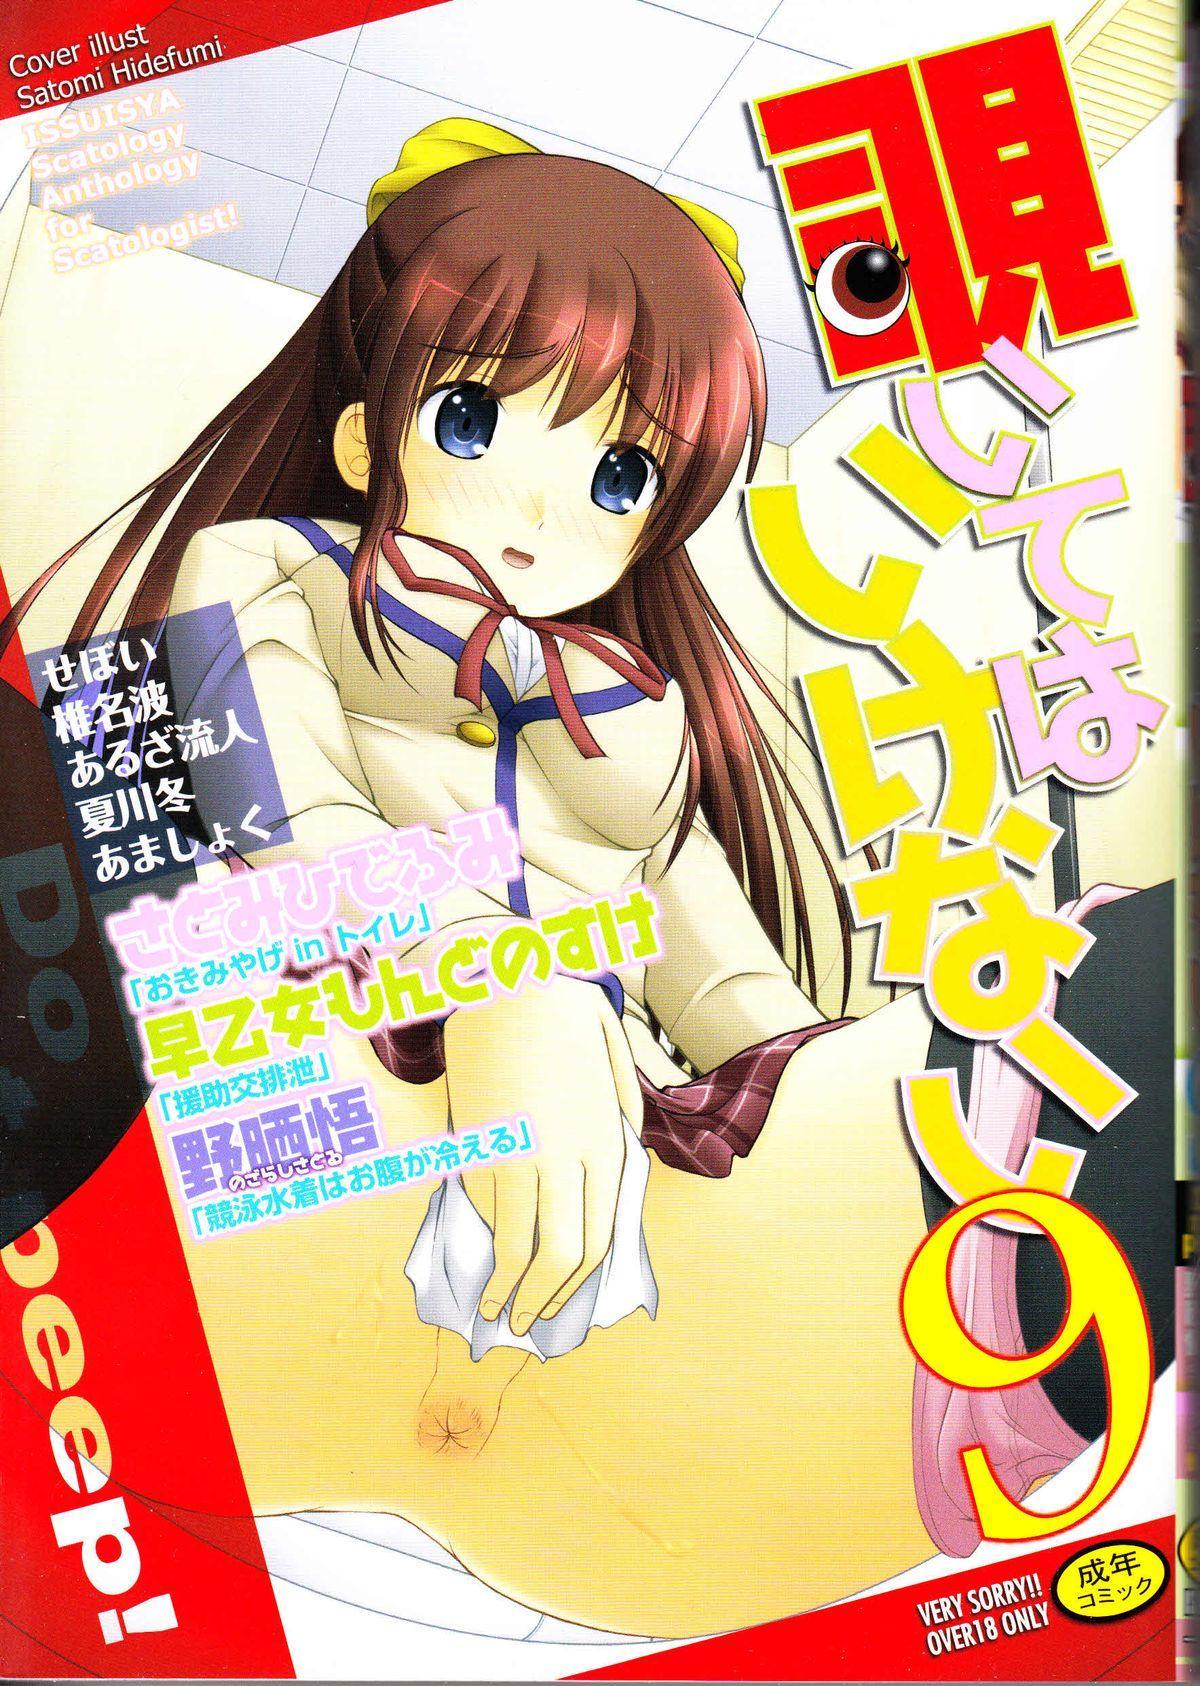 Nozoite wa Ikenai 9 - Do Not Peep! 9 0